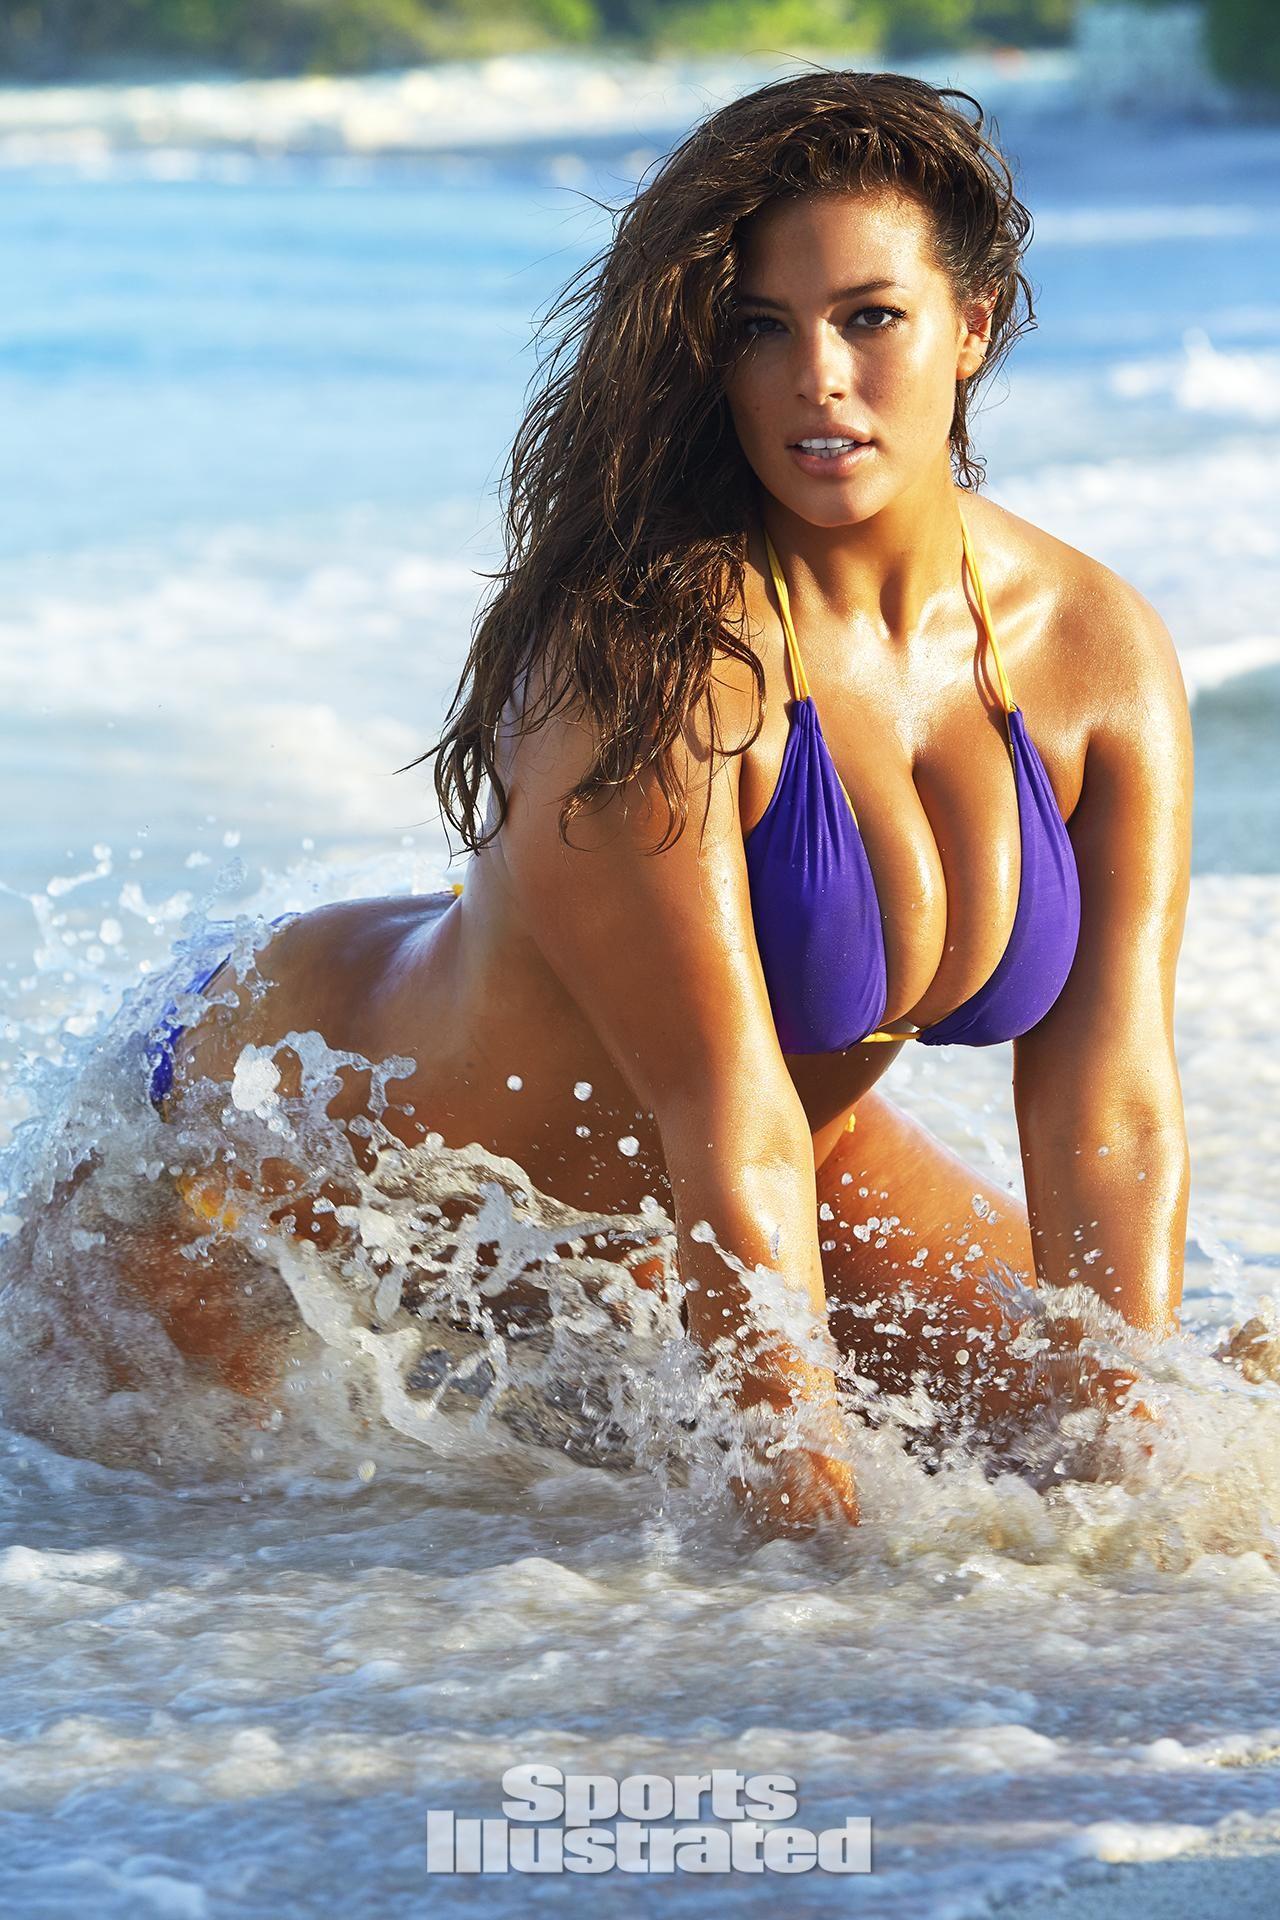 Ashley Graham 2016 Si Swimsuit Photos Sports Illustrated Swimsuit Ashley Graham Sports Illustrated Swimsuit 2016